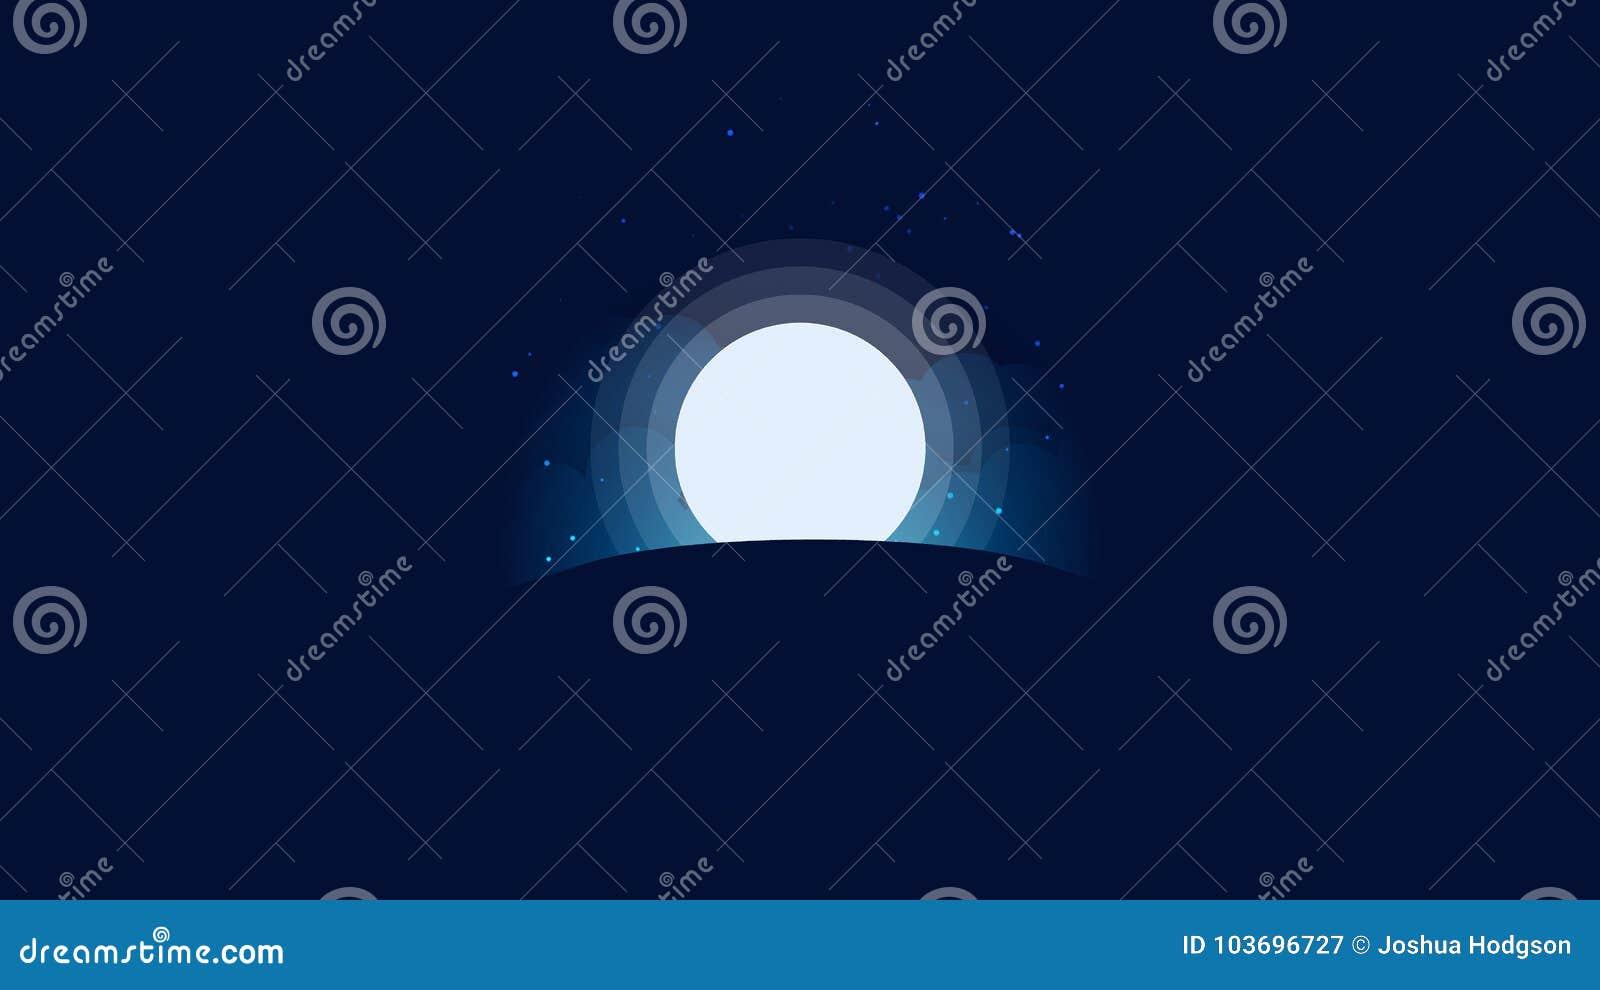 full moon star sky background wallpaper stock vector - illustration